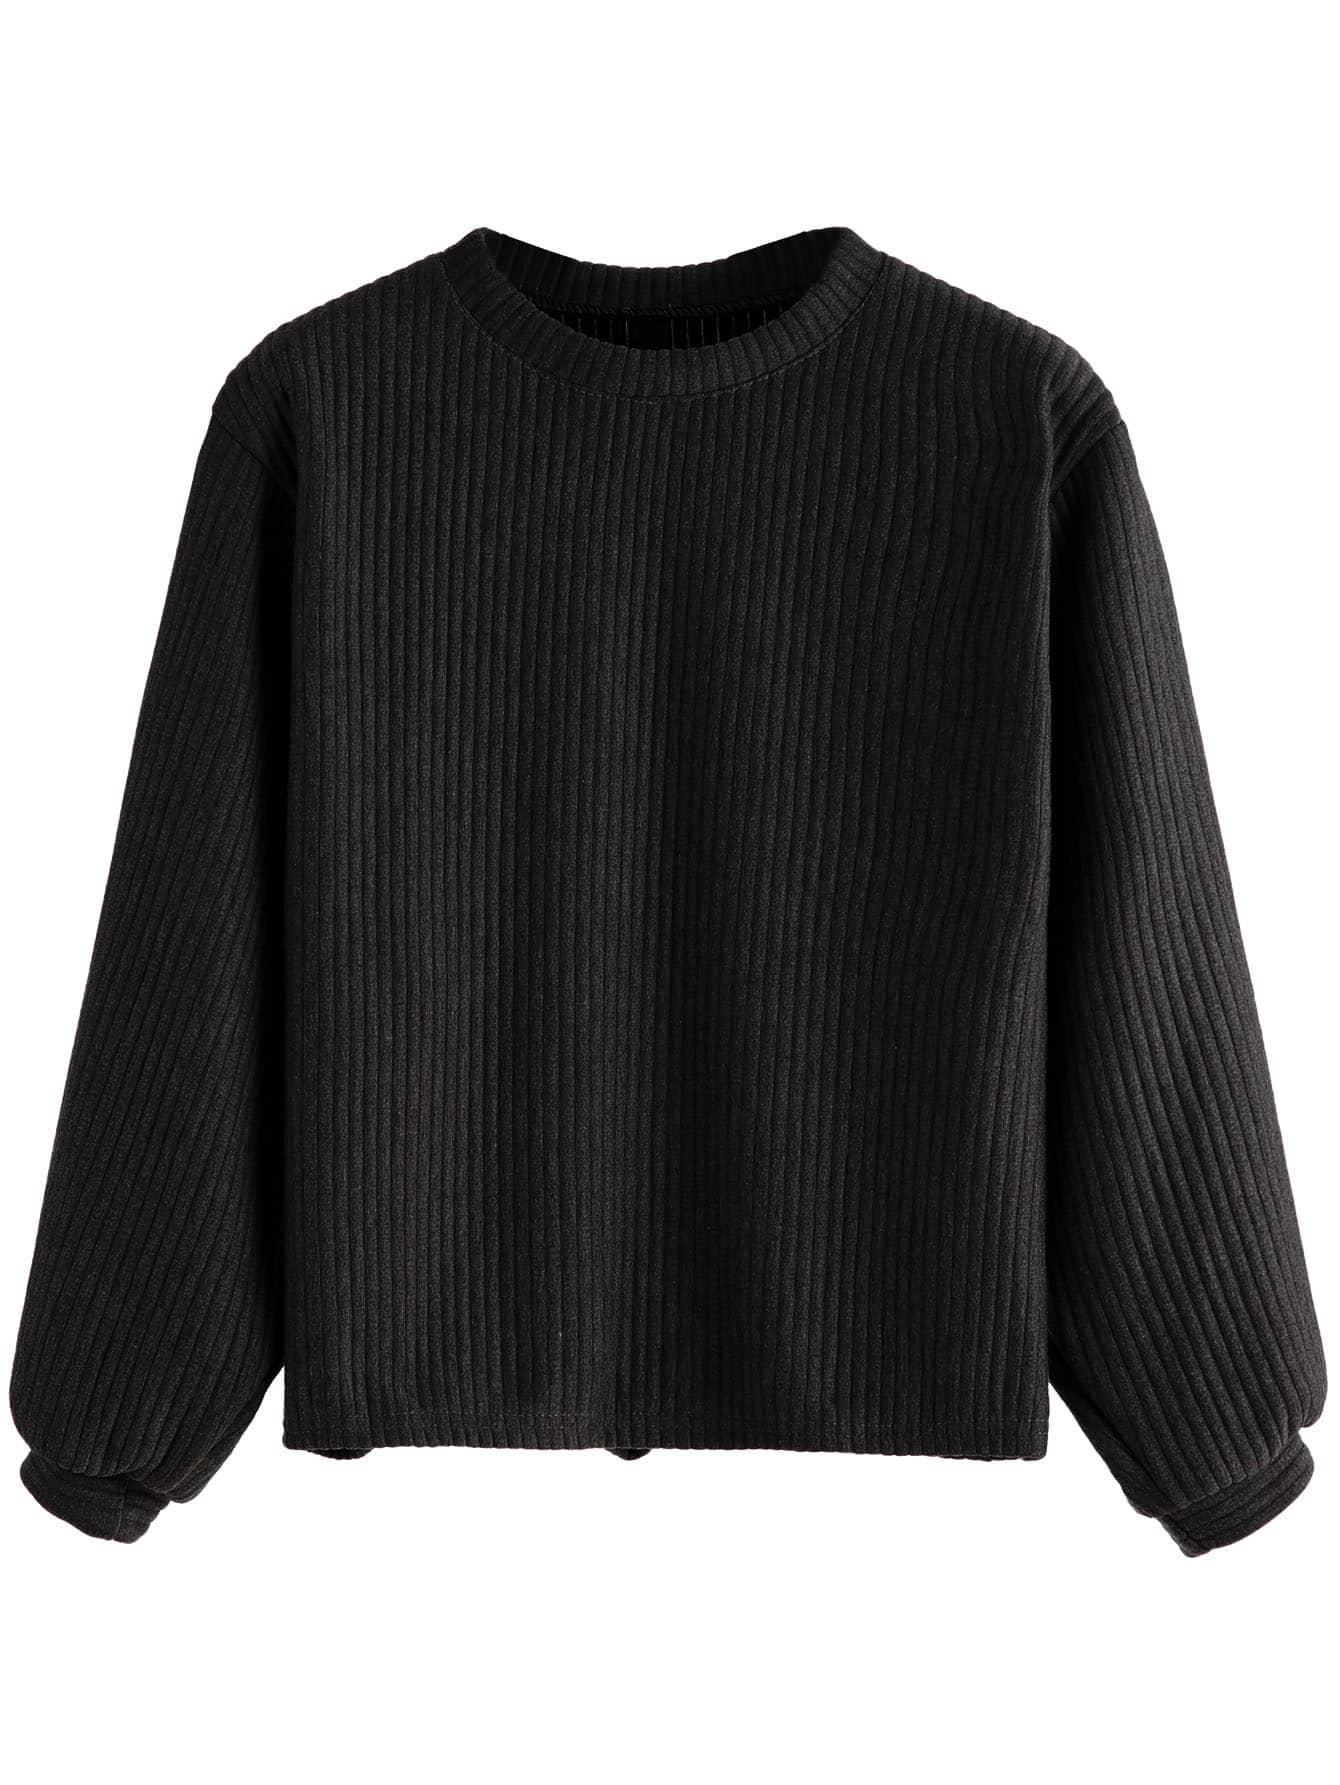 Black Long Sleeve Ribbed Sweatshirt